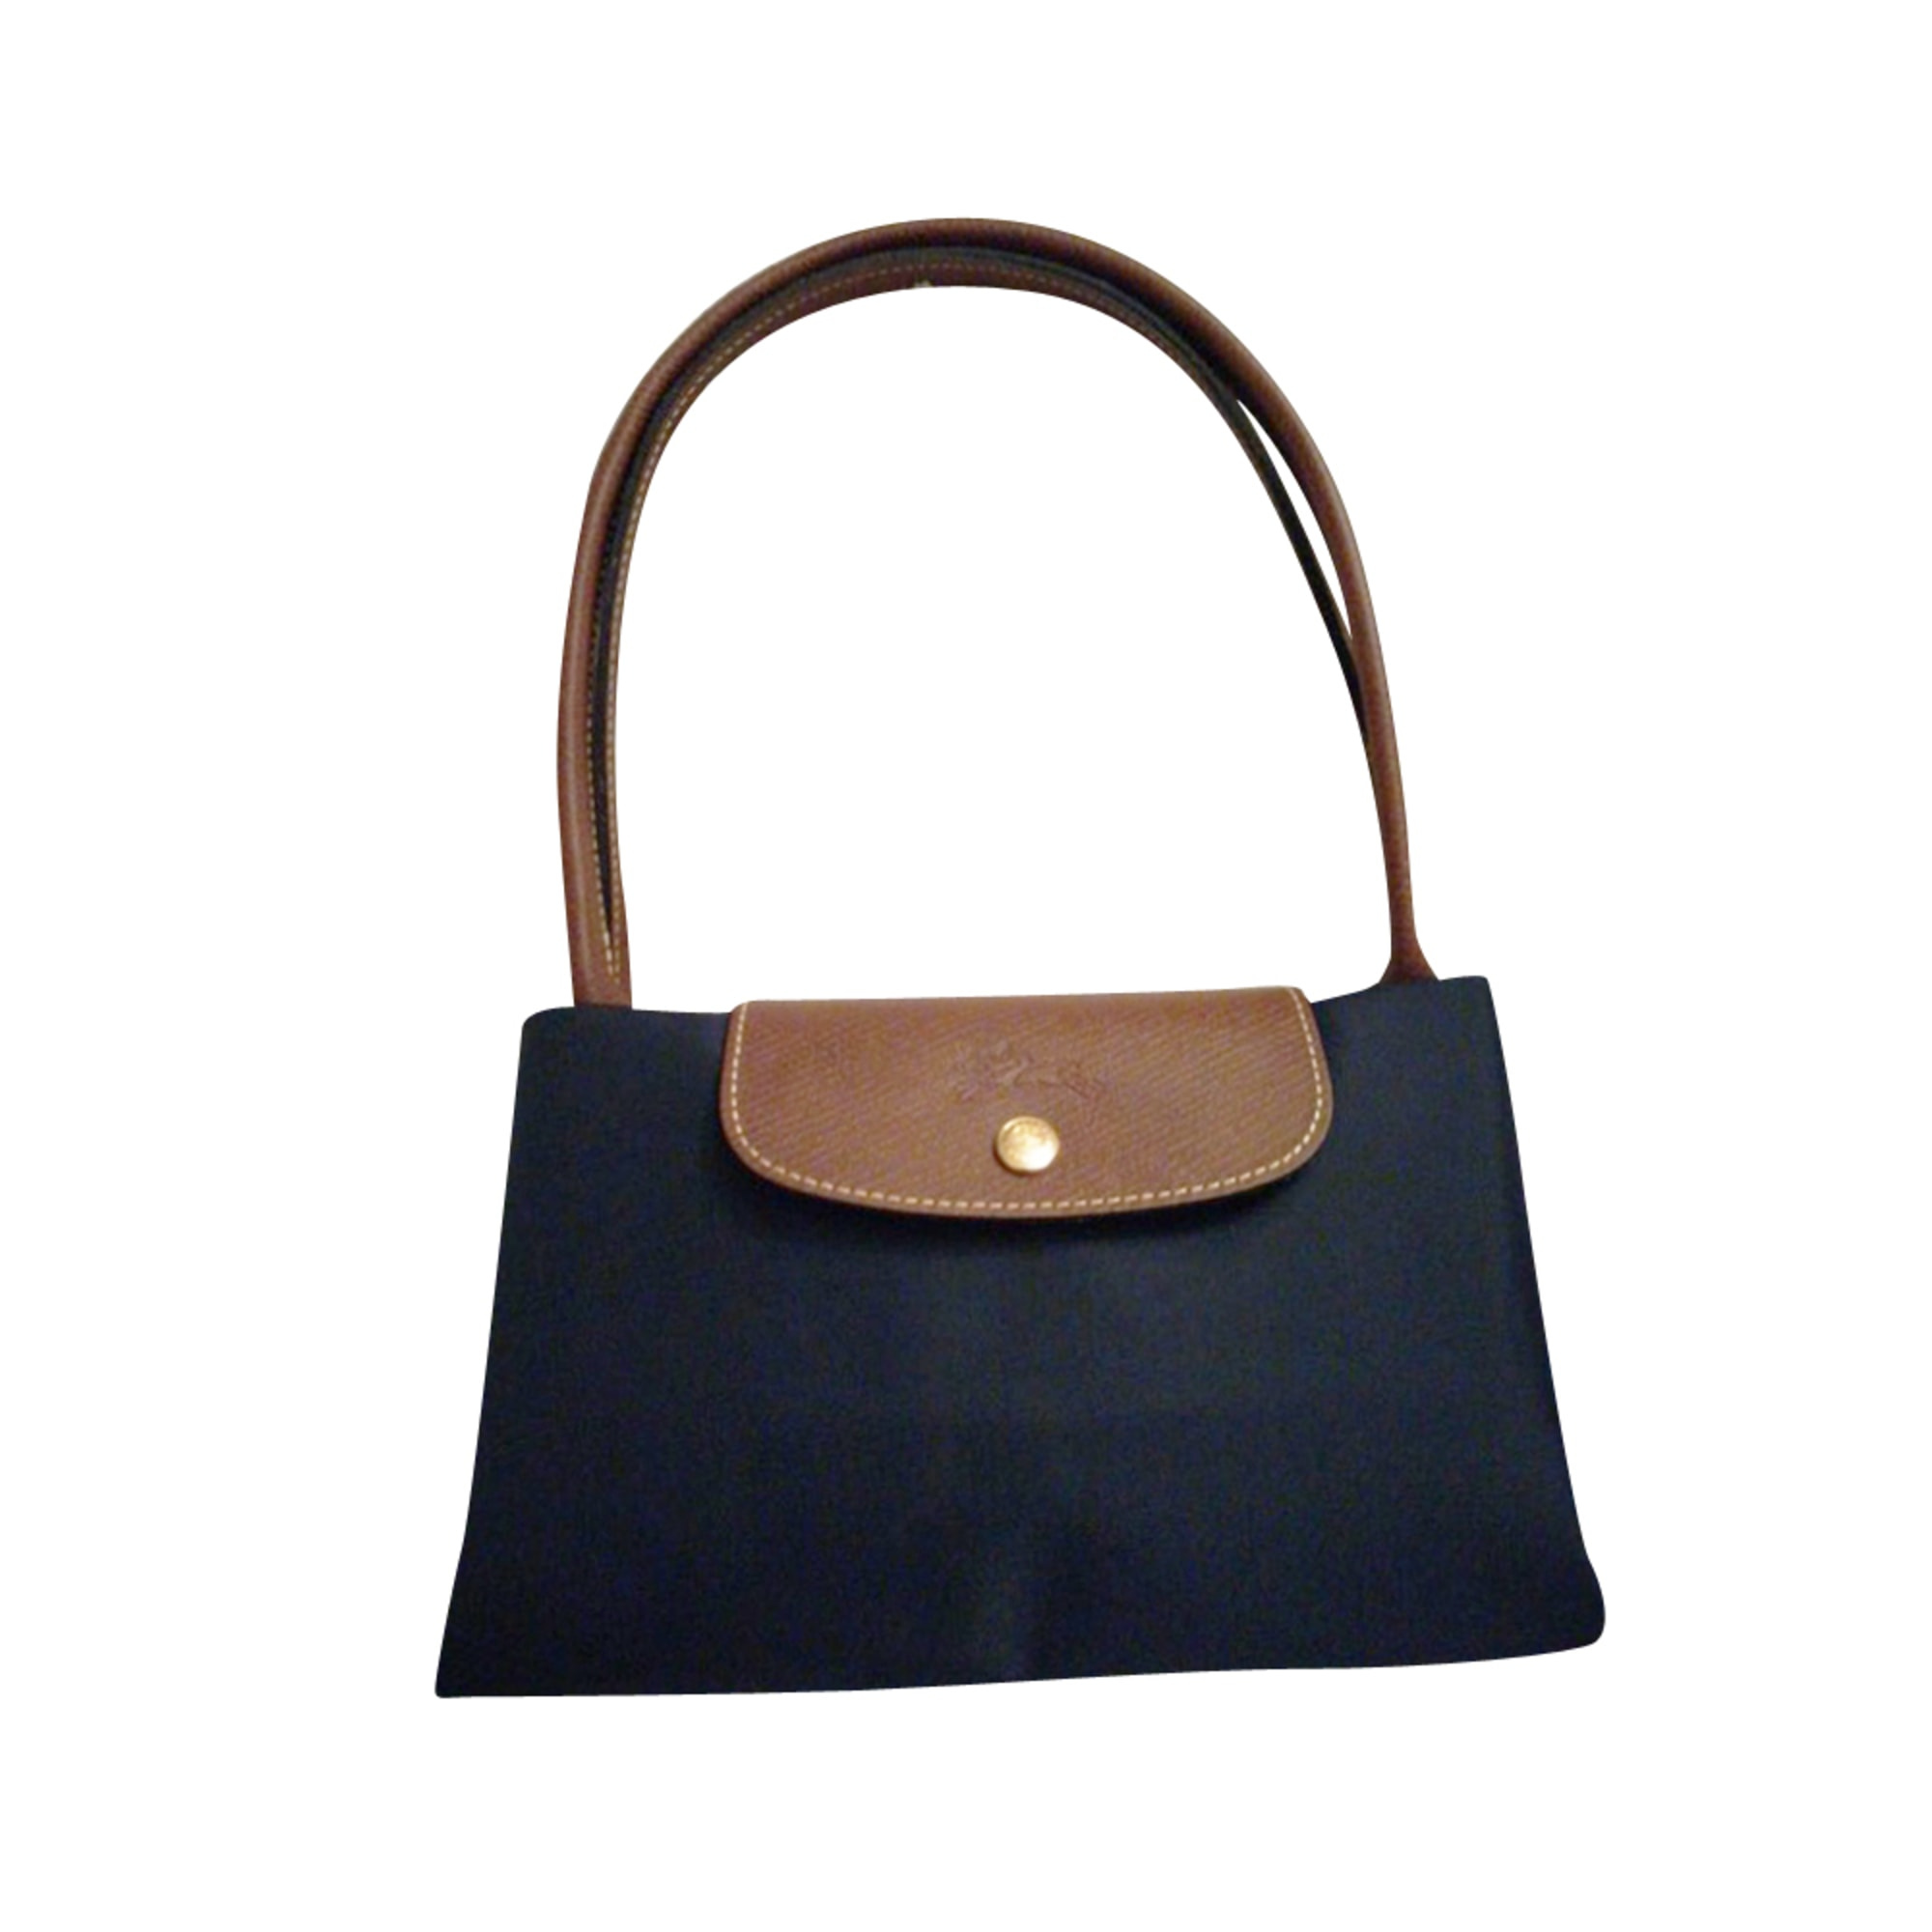 Non-Leather Handbag LONGCHAMP Blue, navy, turquoise